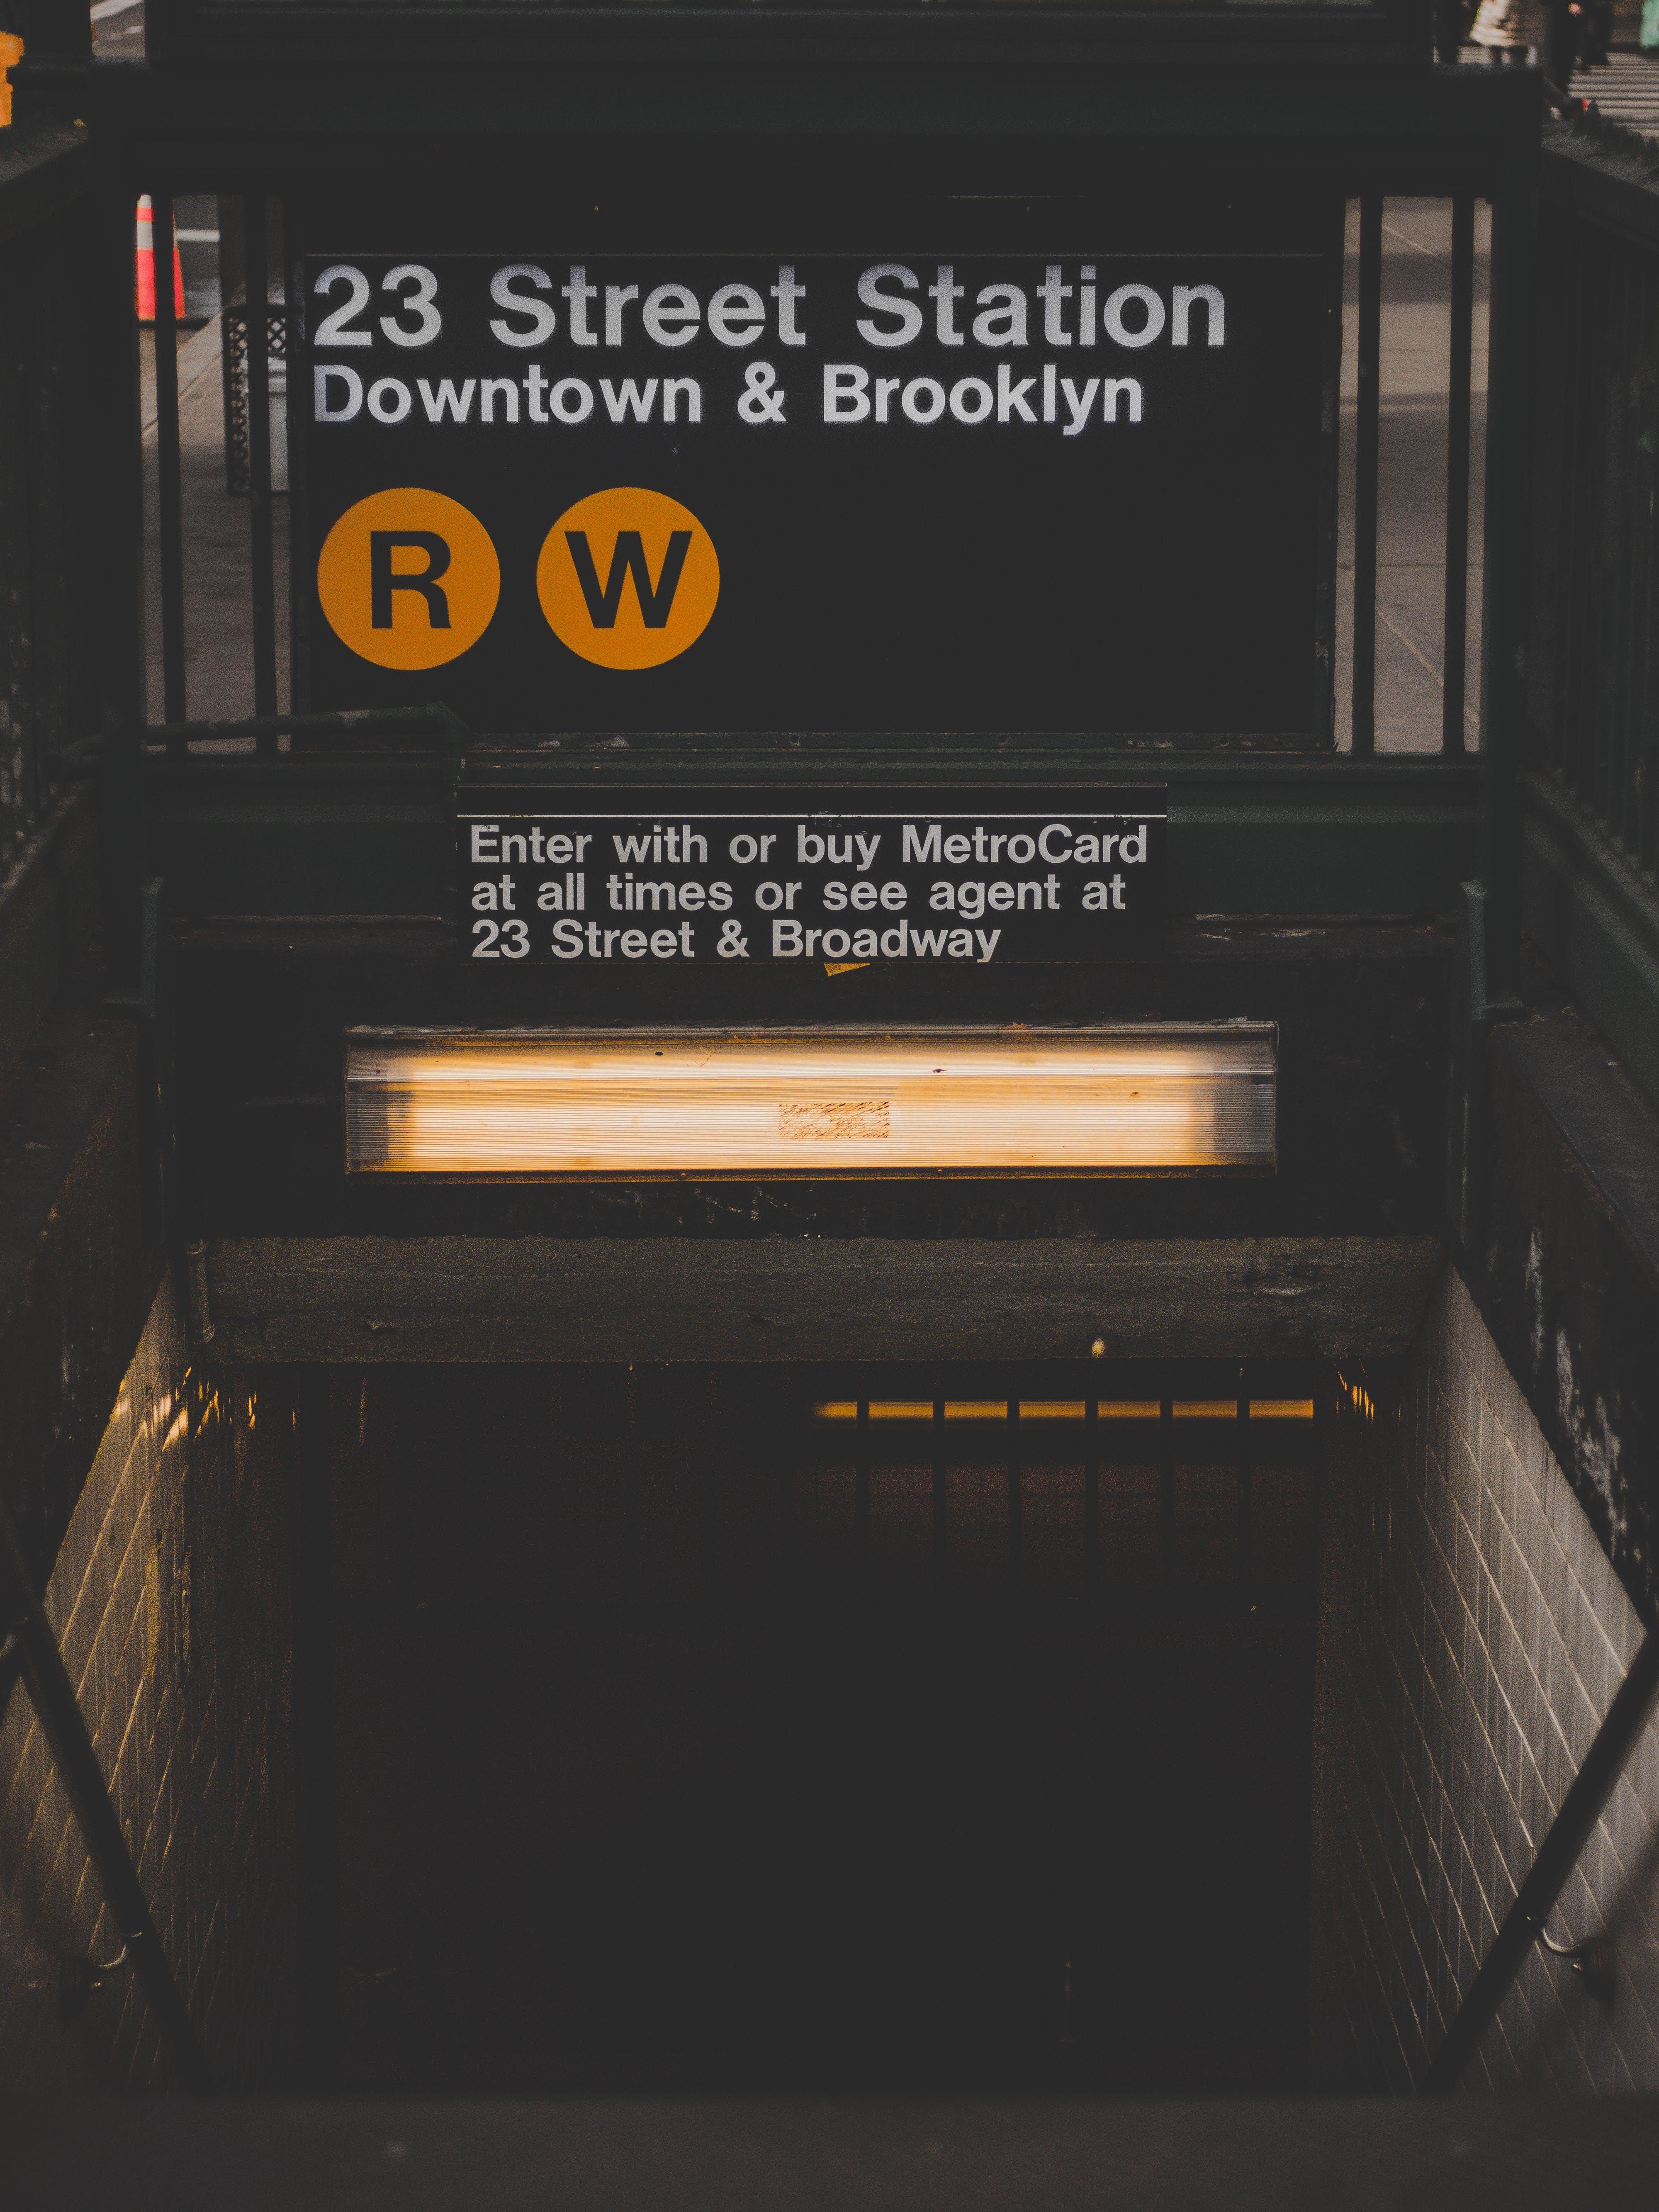 23 Street Station Down & Brooklyn